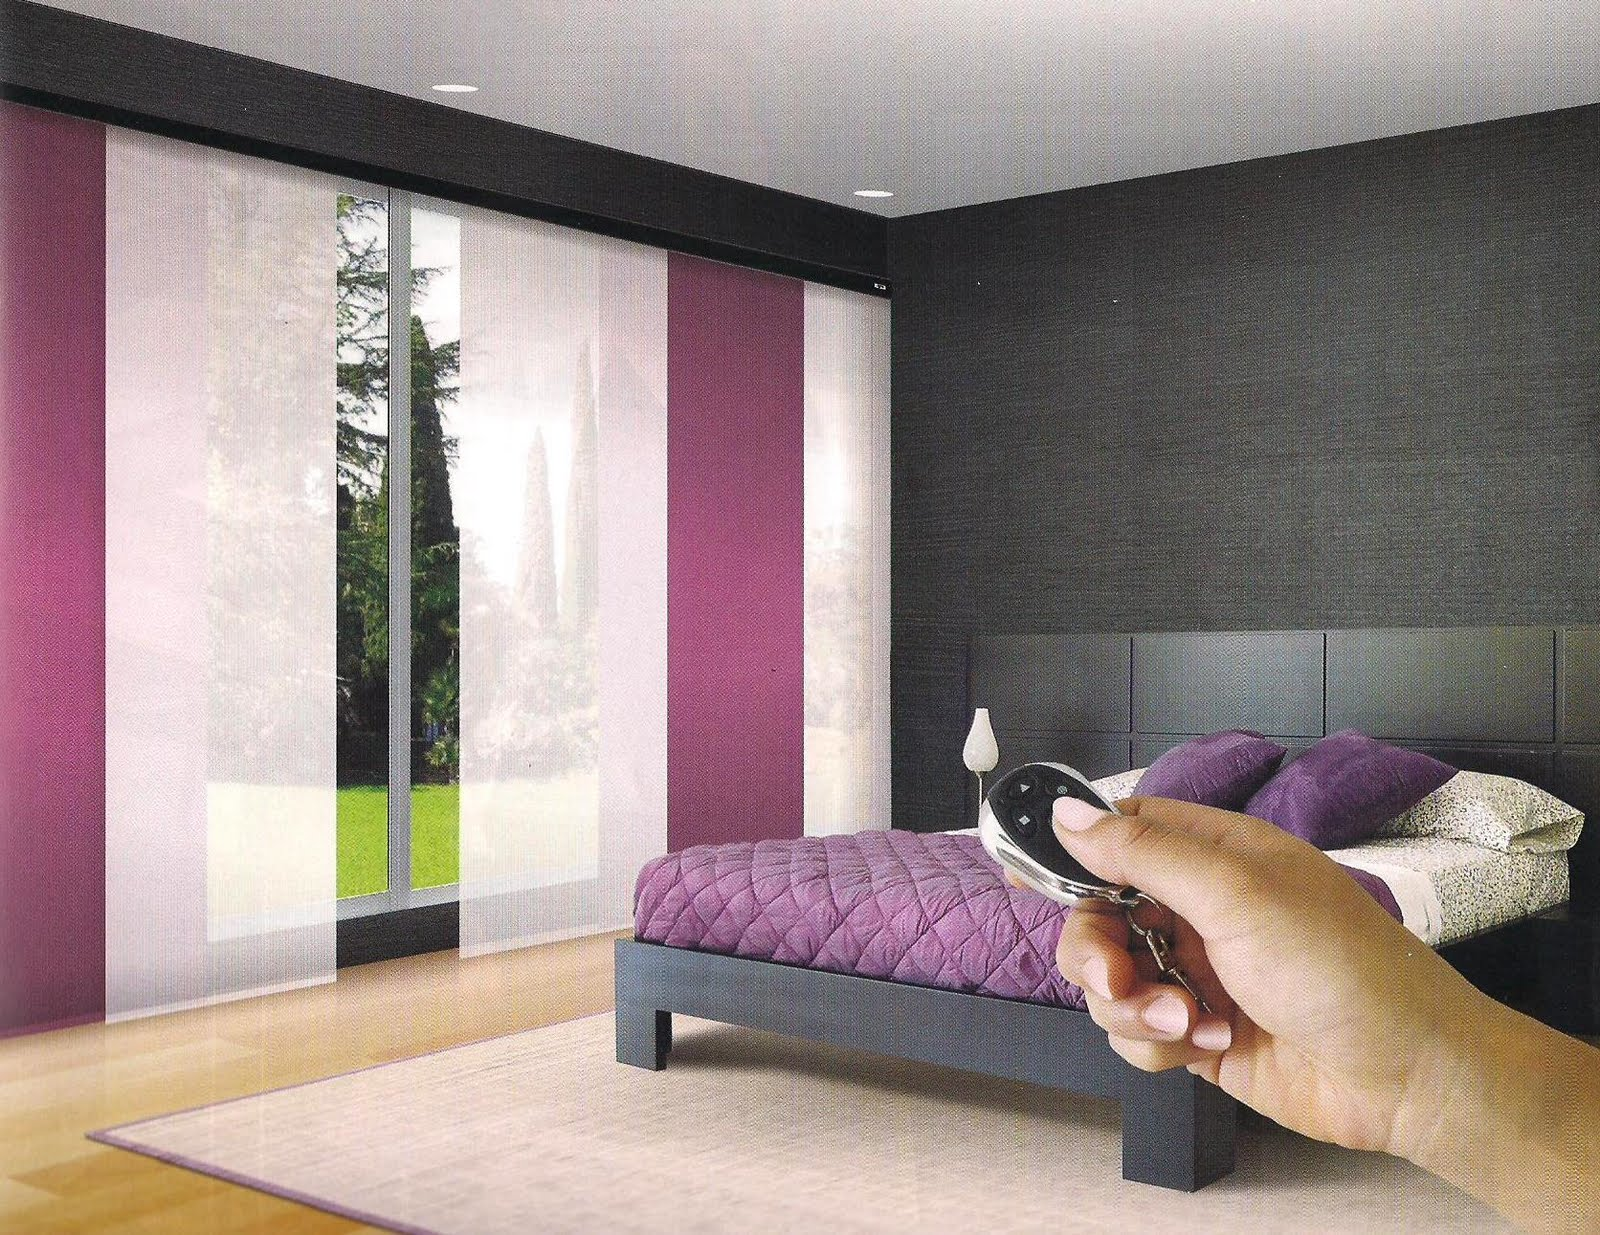 Cortinas maderarte panel japones for Cortinas de dormitorios modernos